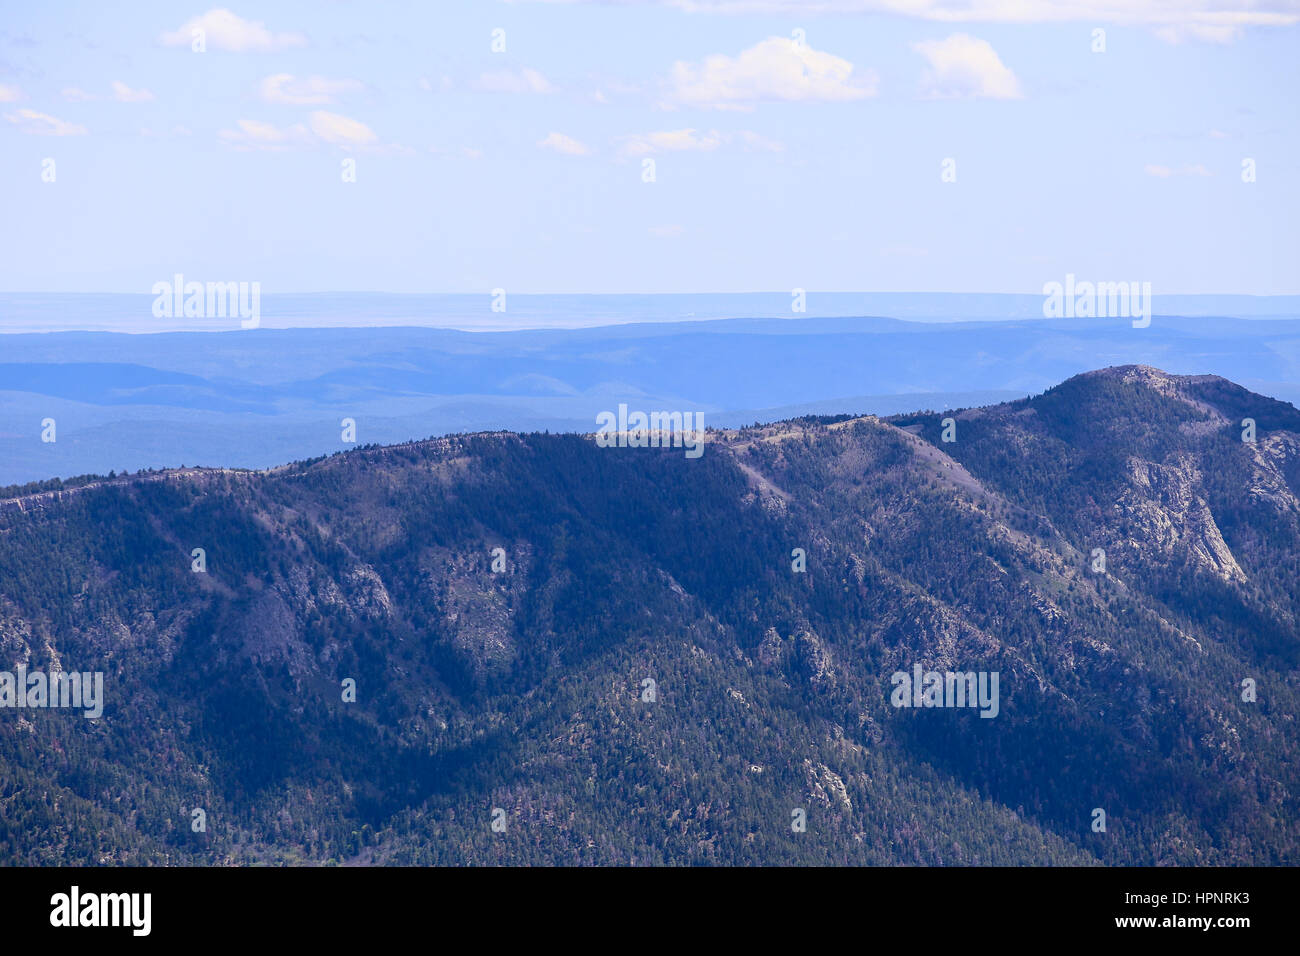 Ridge in the Sandia Mountains near Albuquerque, USA, seen from Sandia Crest. Stock Photo